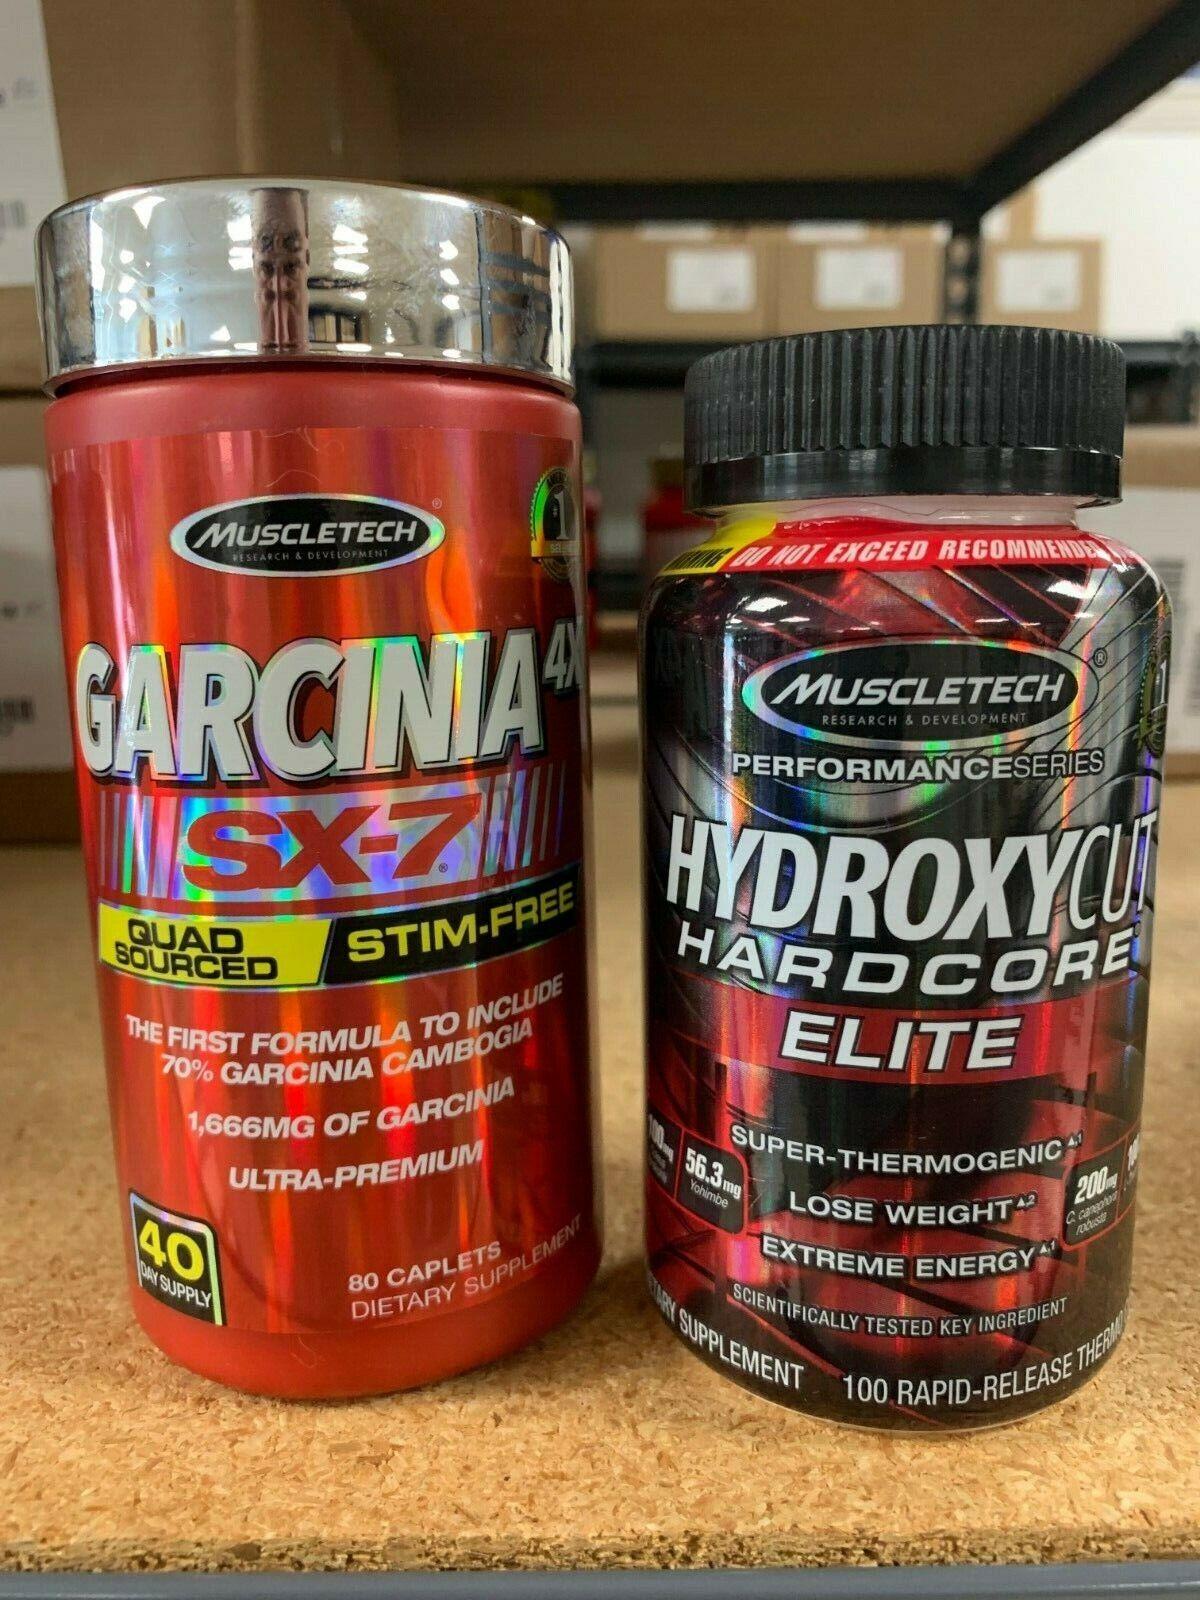 Hydroxycut Stack! Garcinia 4X SX7 80ct & Hydroxycut Elite 10